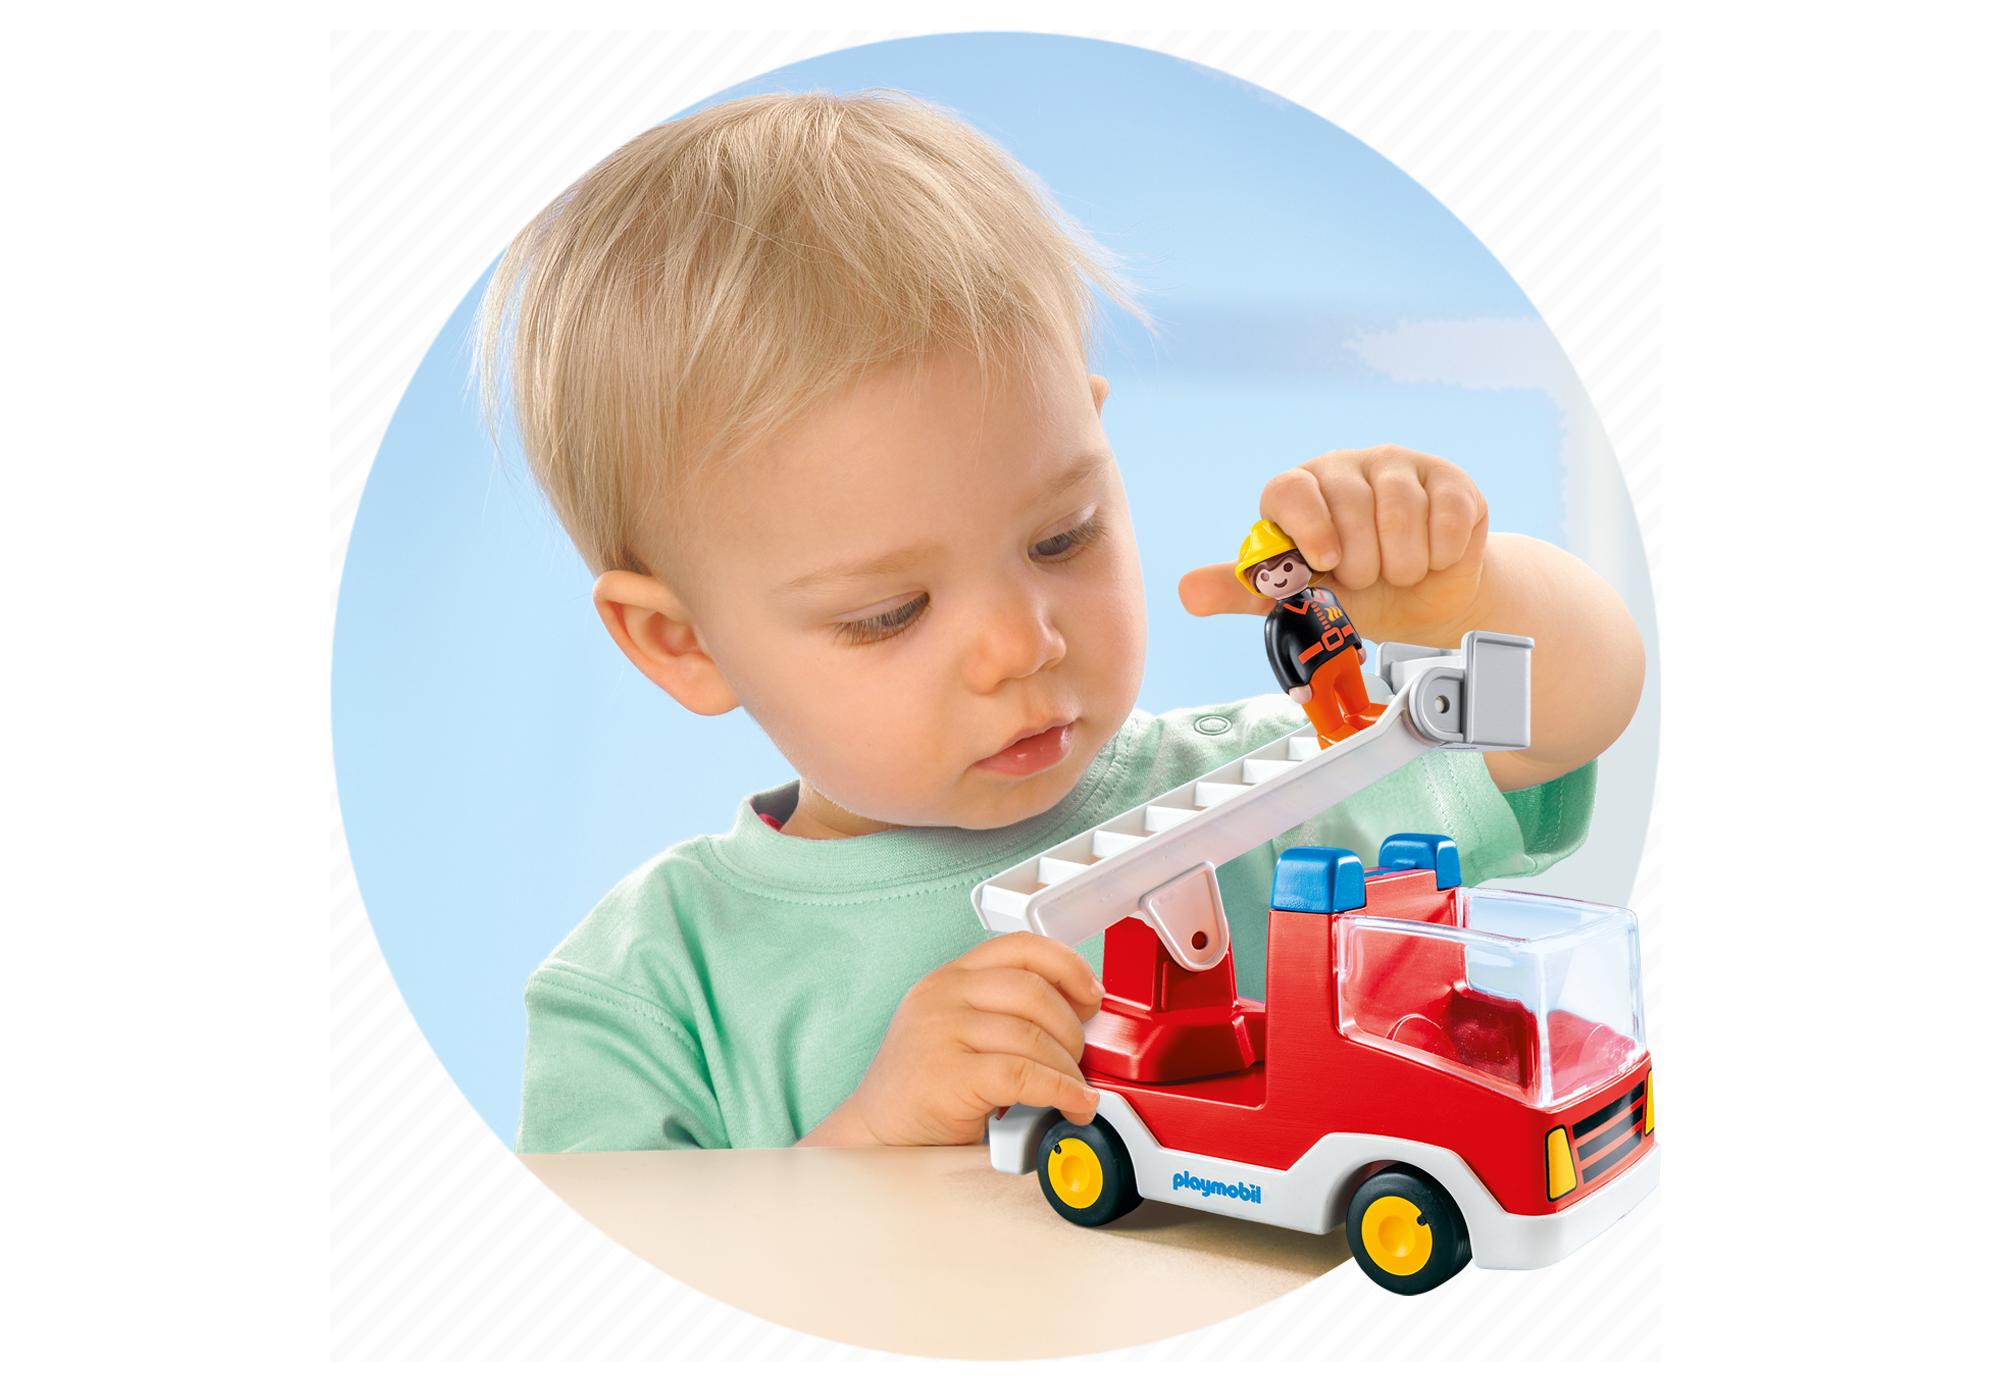 http://media.playmobil.com/i/playmobil/6967_product_extra1/Brandweerwagen met ladder